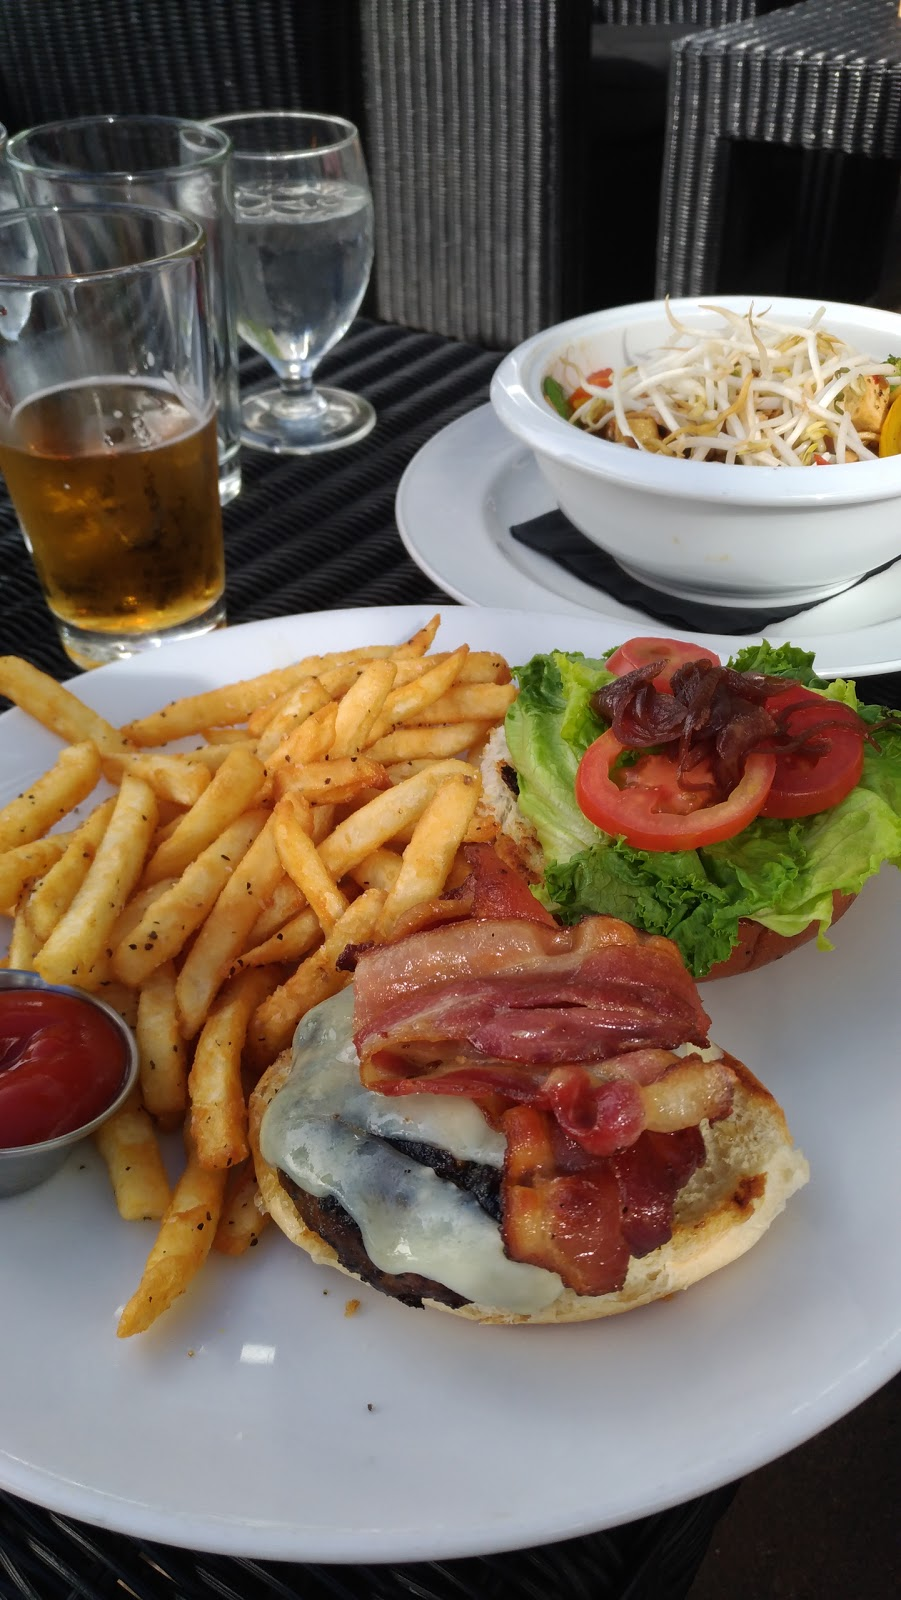 Glo Restaurant + Lounge   restaurant   2940 Jutland Rd, Victoria, BC V8T 5K6, Canada   2503855643 OR +1 250-385-5643